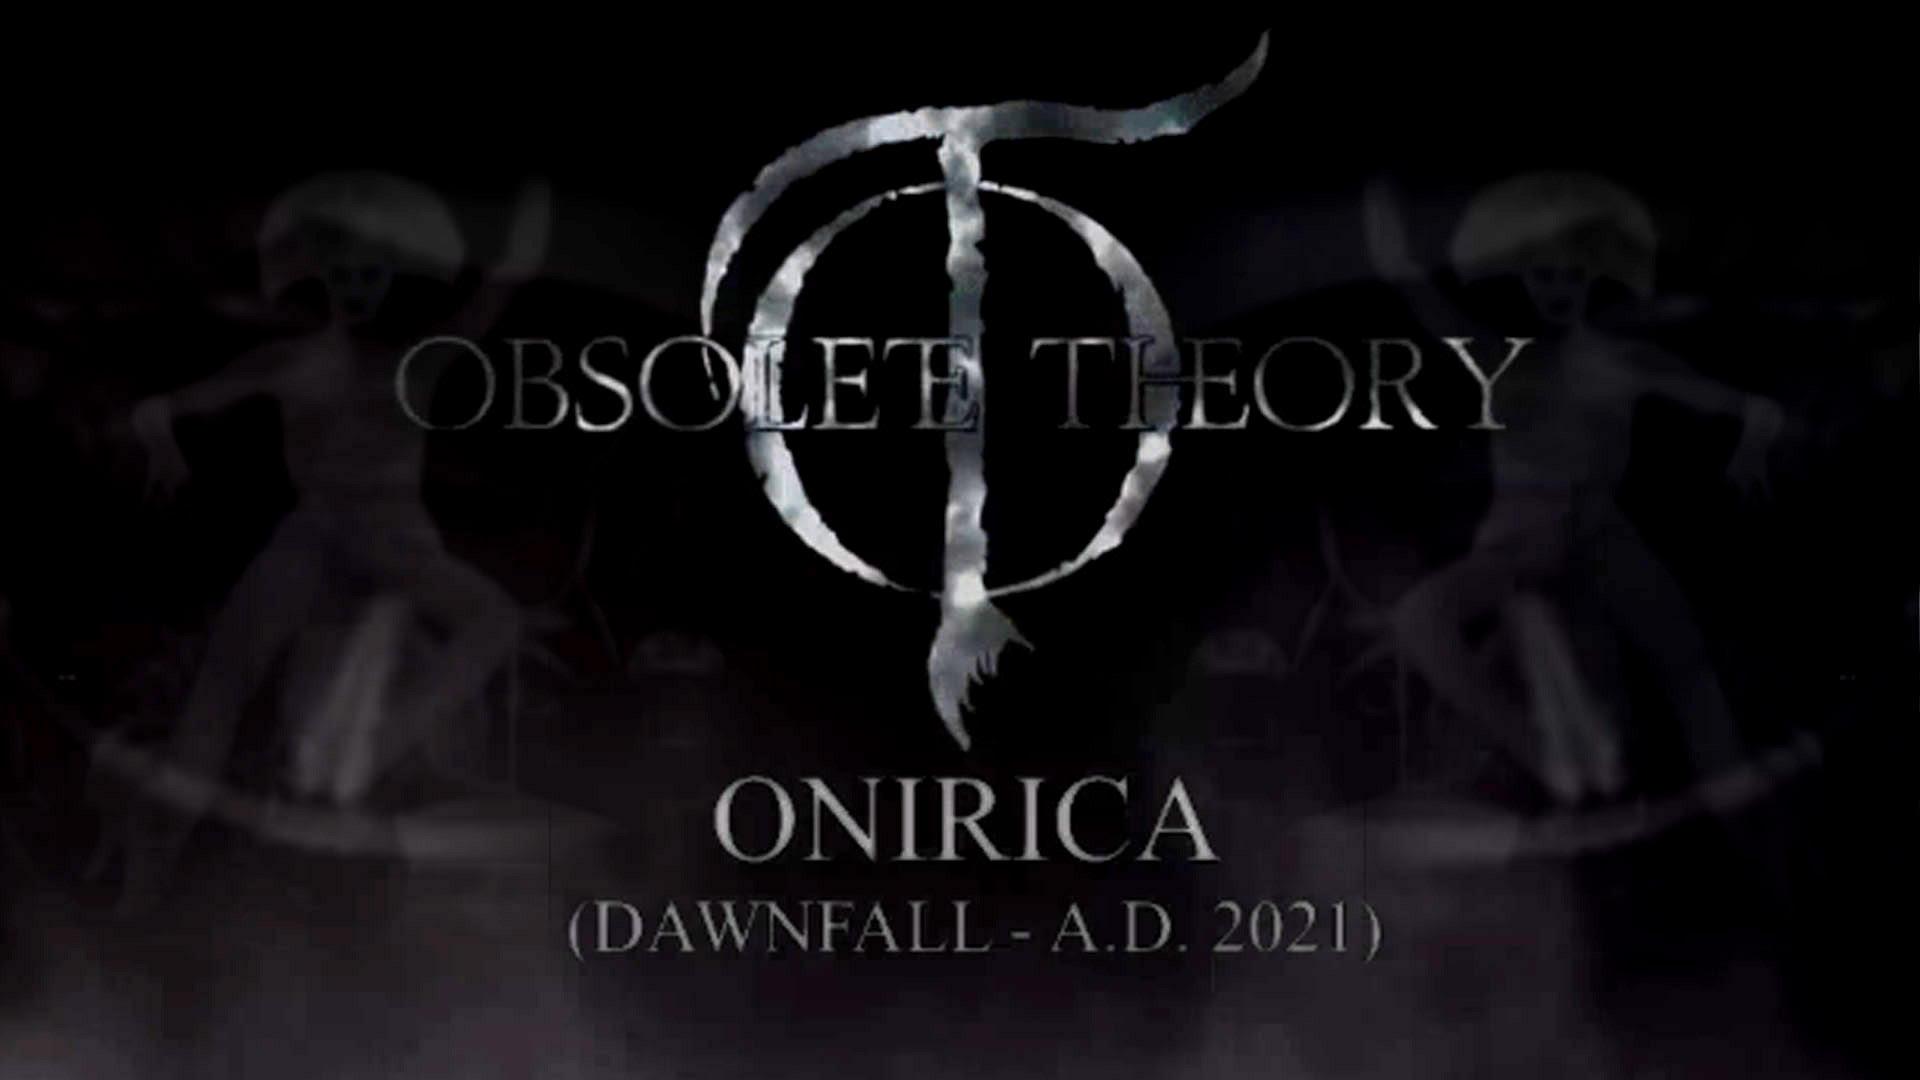 OBSOLETE THEORY: Πρεμιέρα έκανε το βίντεο του τραγουδιού «Onirica» από το νέο τους album.